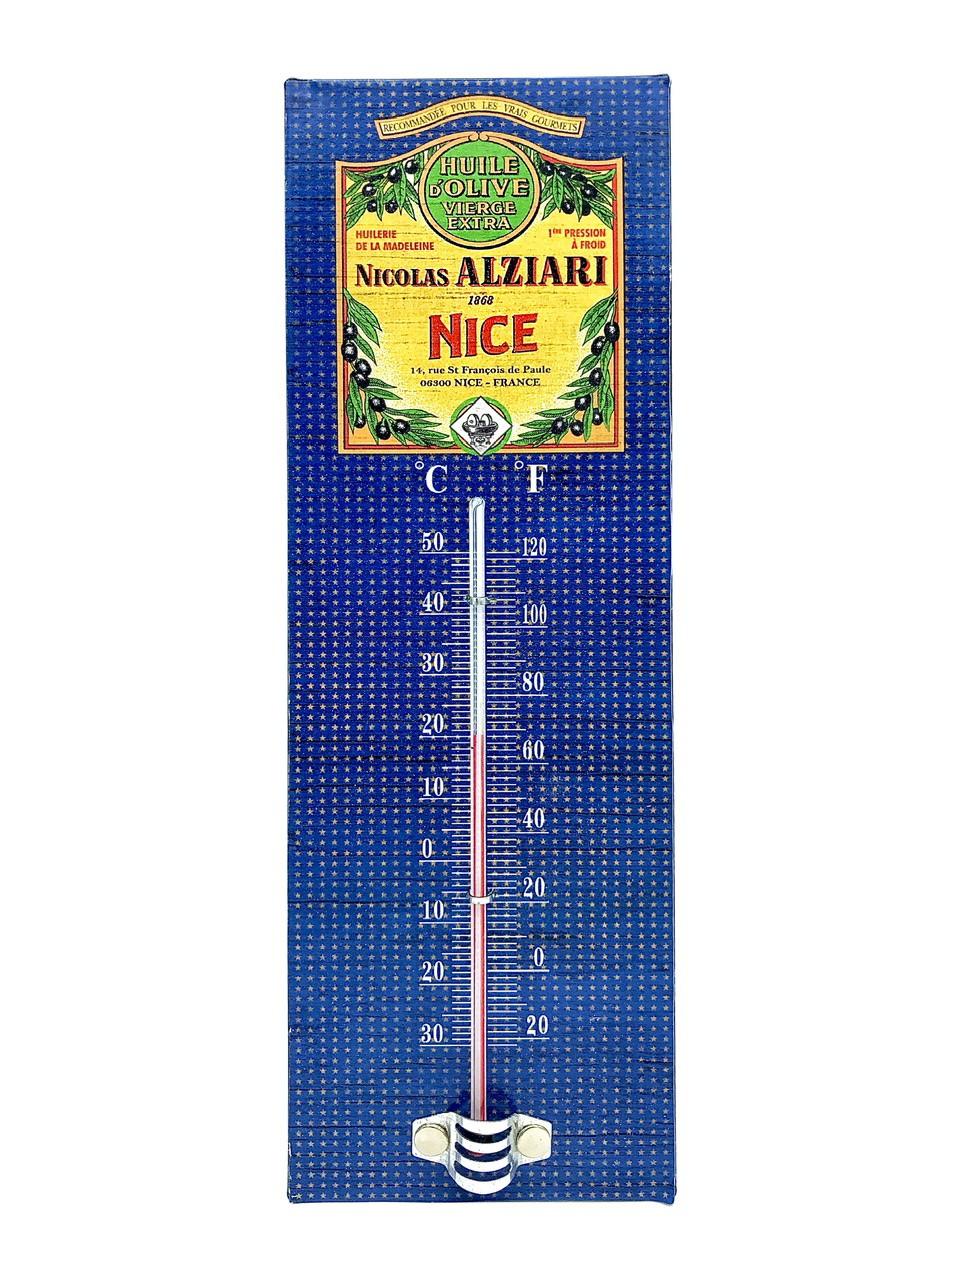 Thermomètre vintage Huile d'olive Nicolas Alziari Nice 8X25cm (métal)